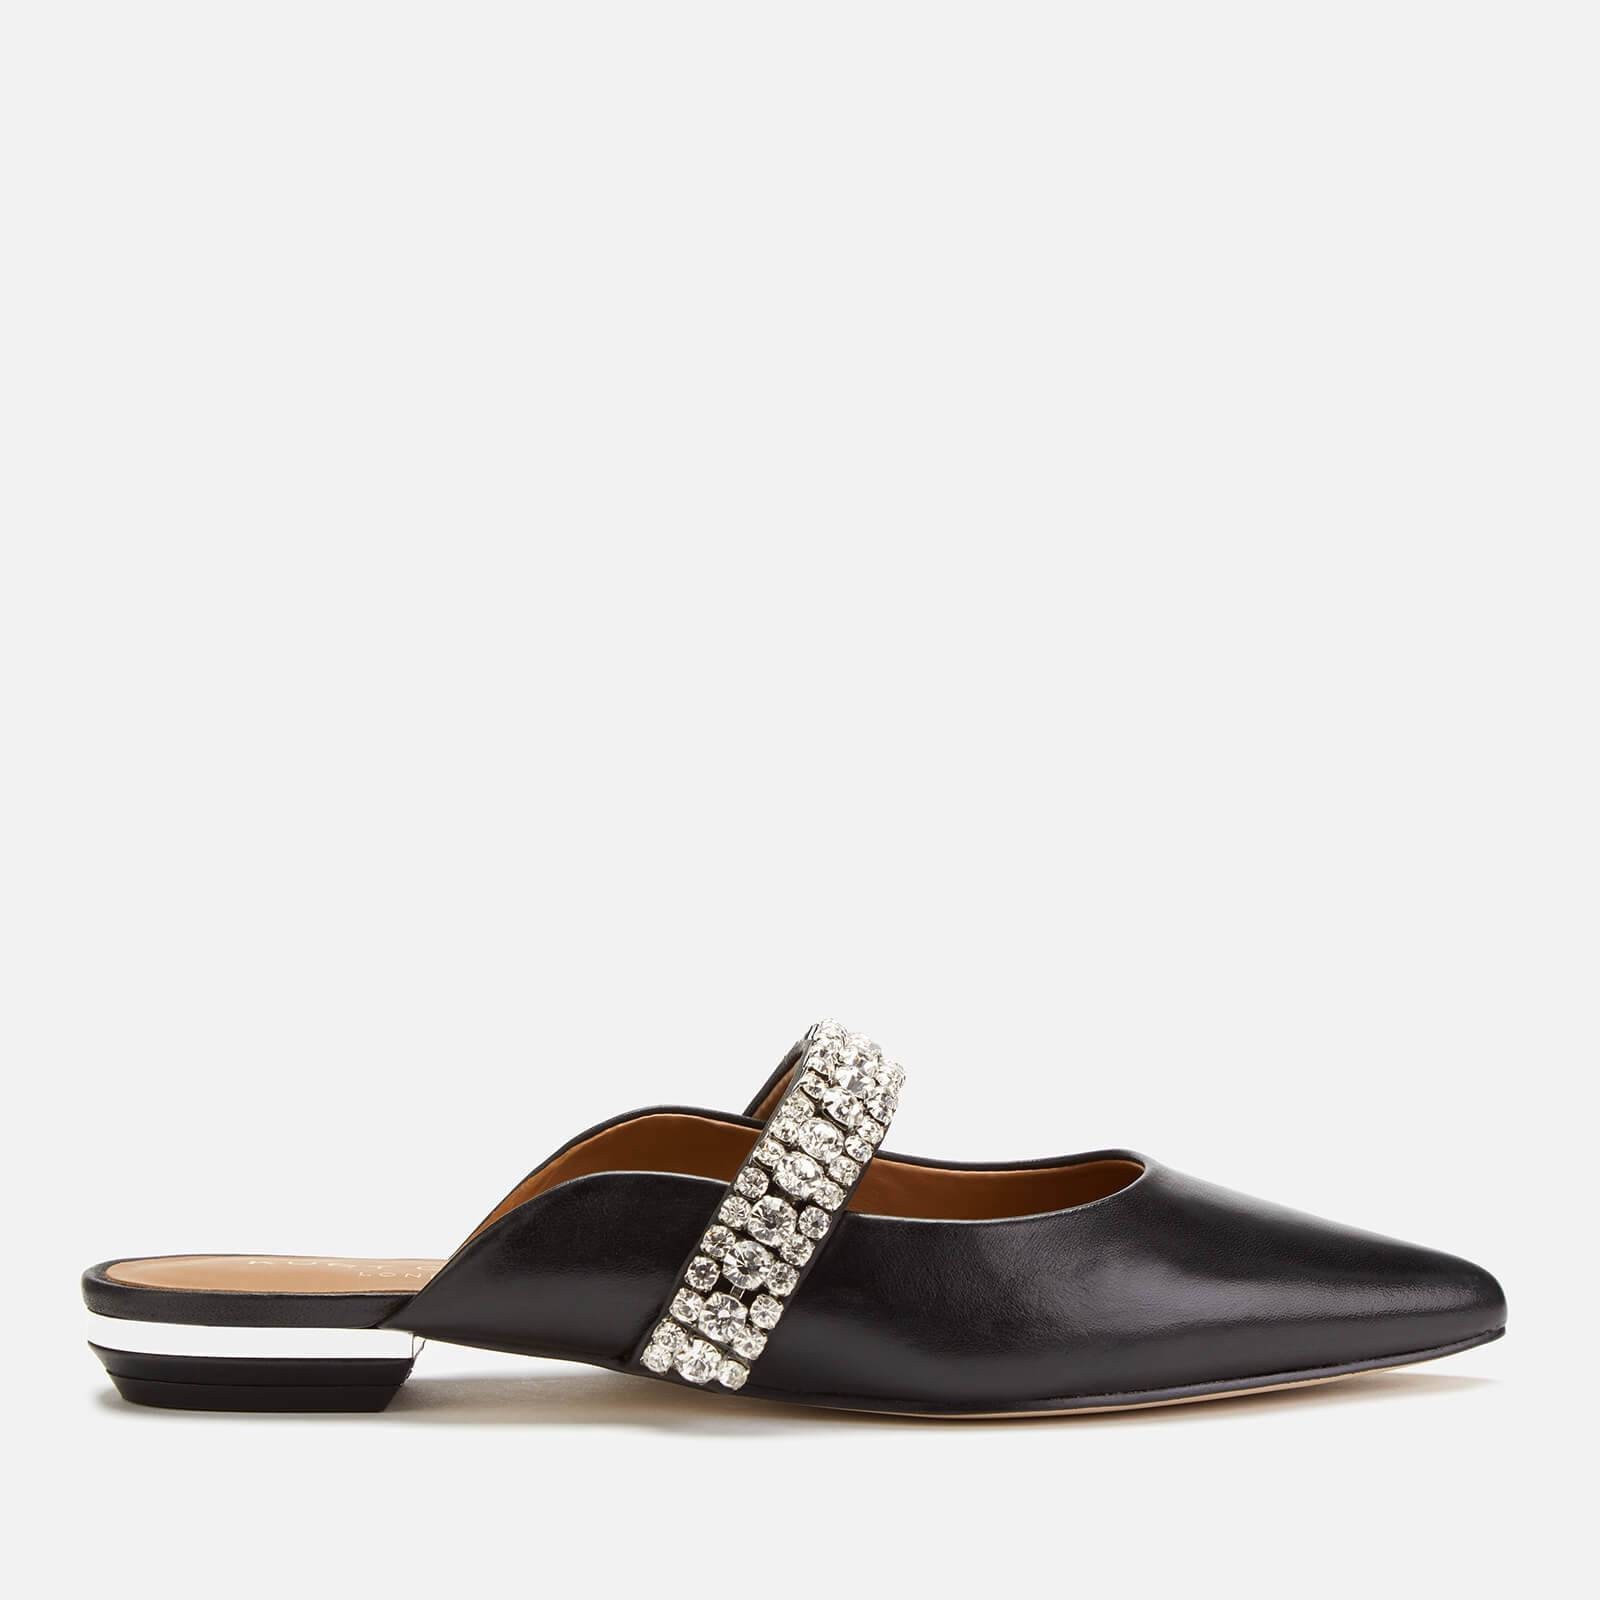 Kurt Geiger London Women's Princely Leather Flat Mules - Black - UK 4 - Black